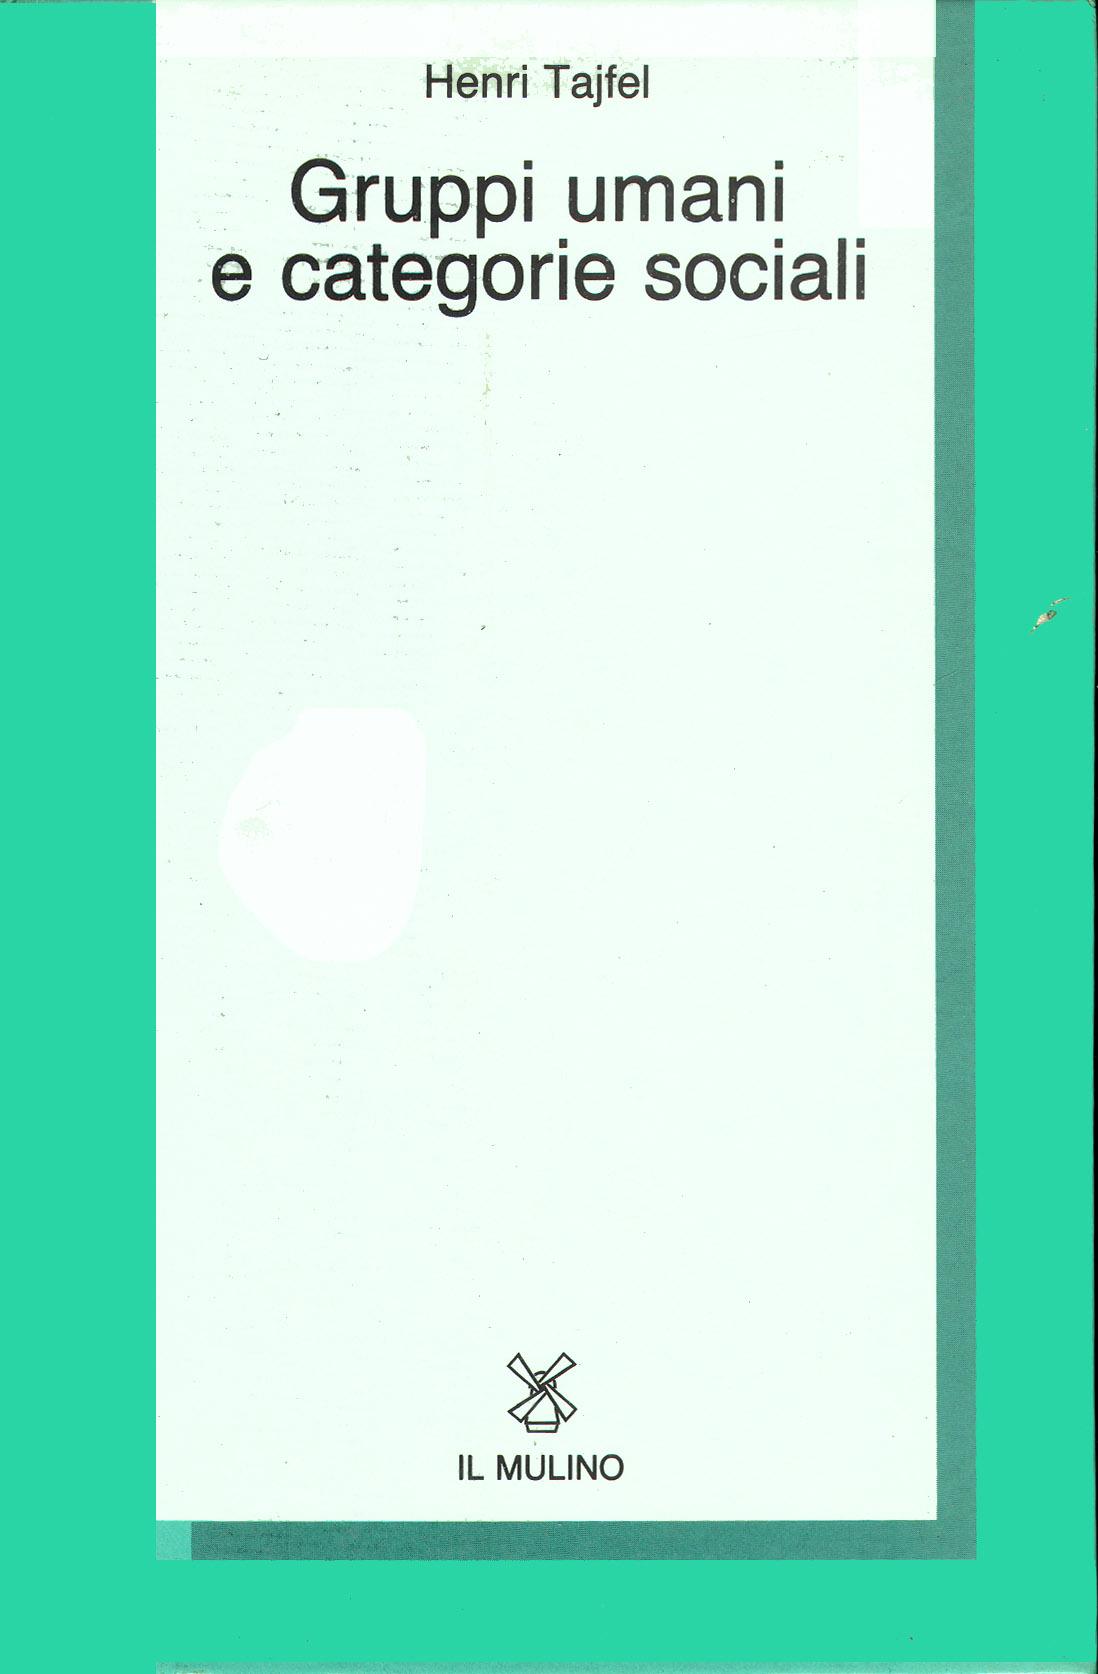 Gruppi umani e categorie sociali